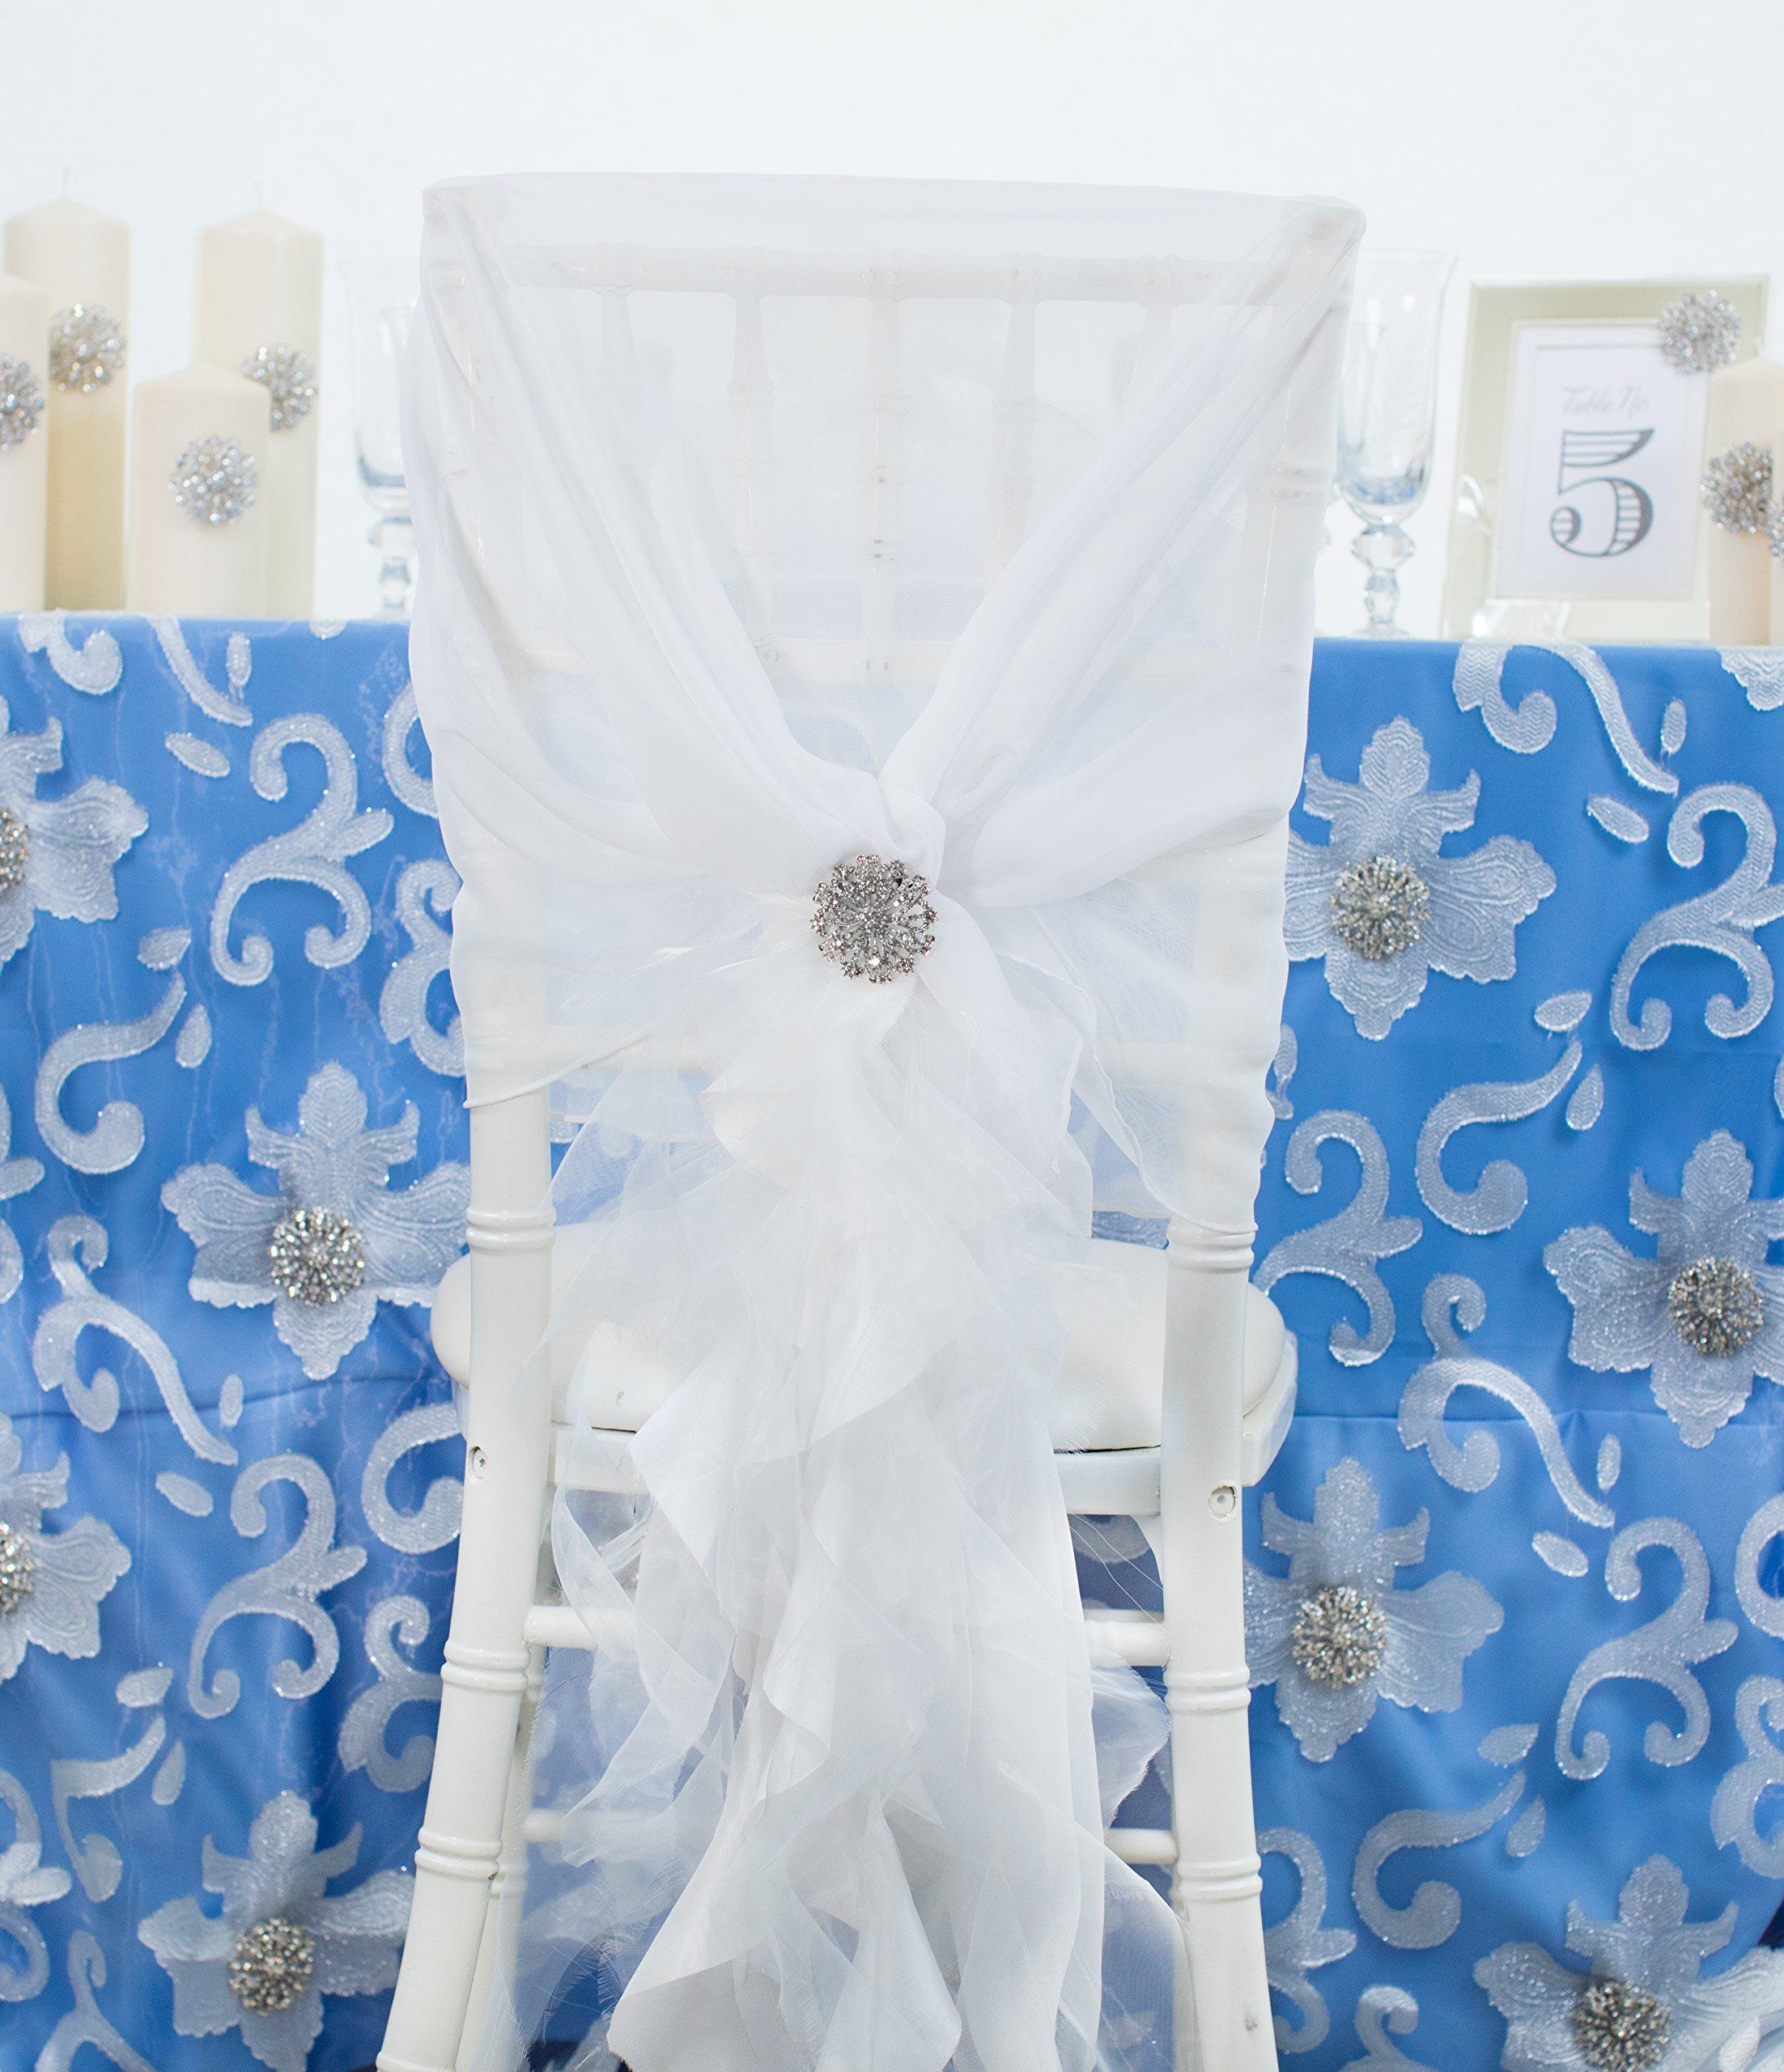 Brooches for Weddings Bulk, 100pcs Rhinestone Brooches 2 inches -Totally Dazzled by Totally Dazzled (Image #8)